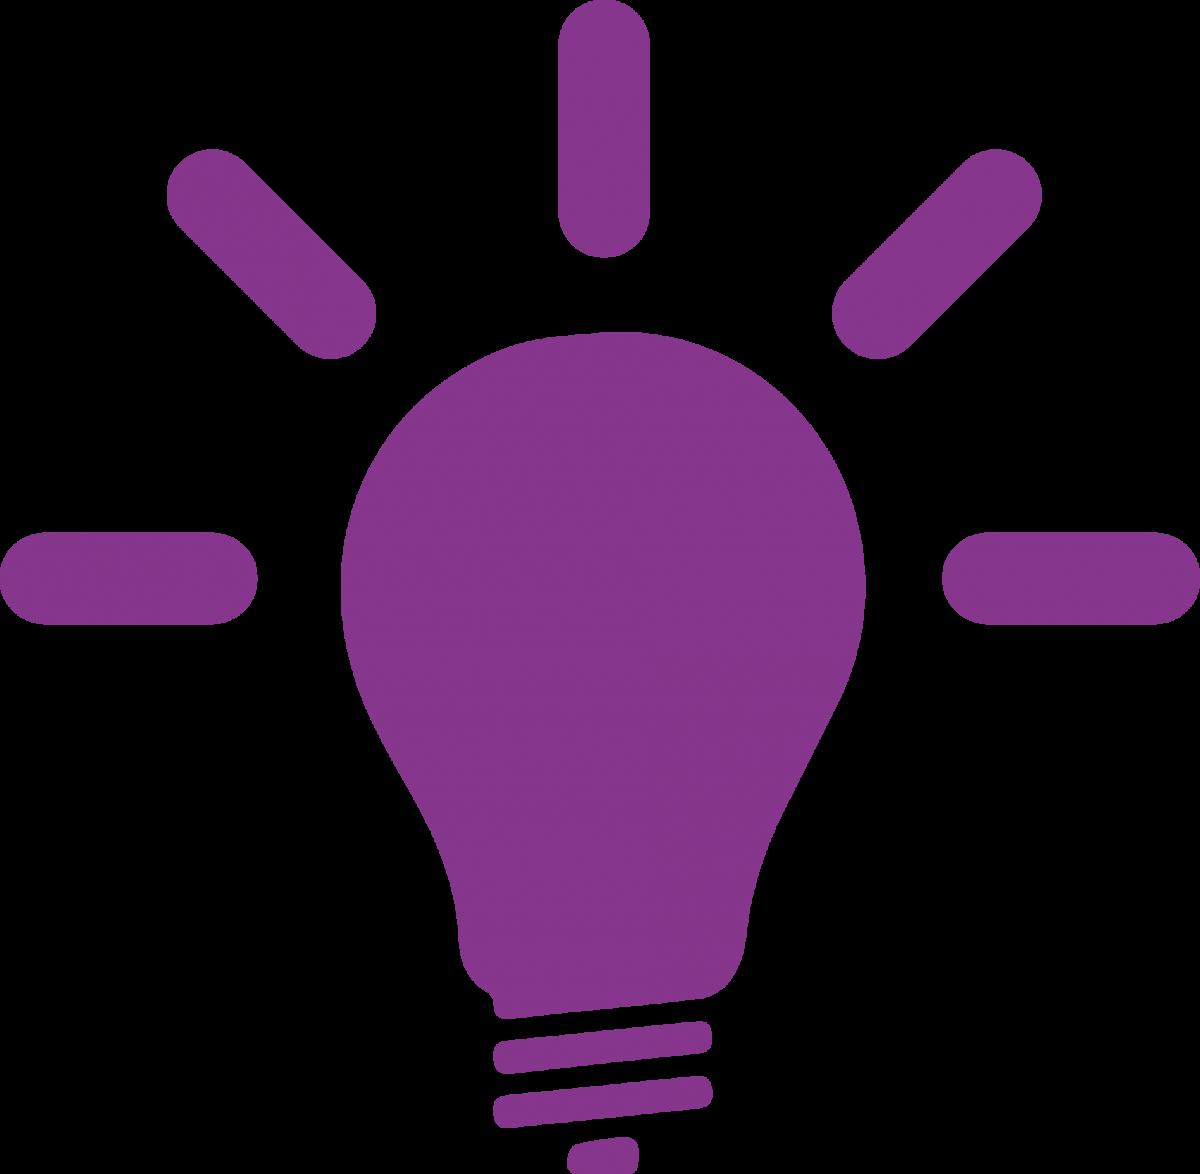 Mct advanced learn treasury. Diploma clipart purple